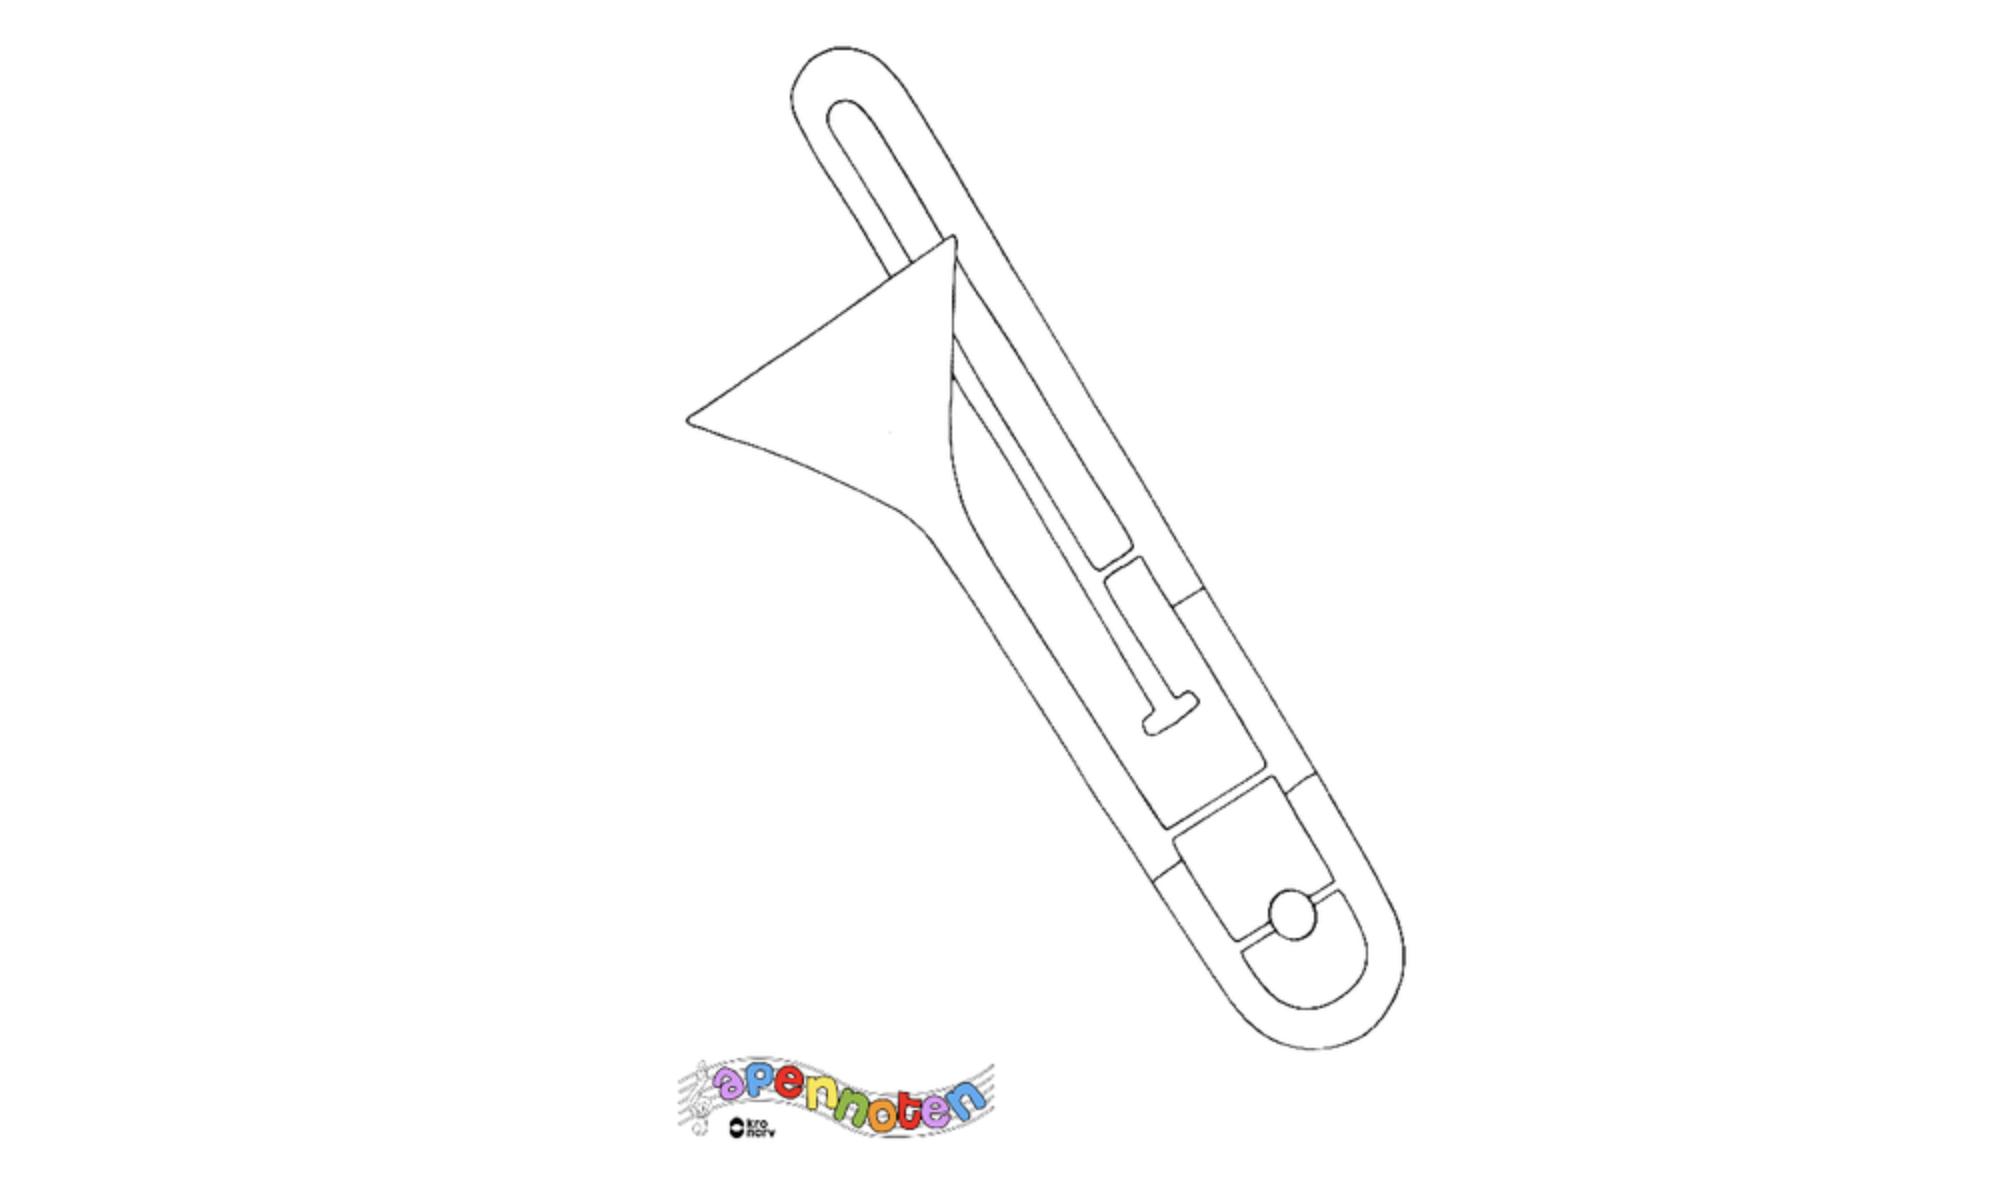 Apennoten - trombone